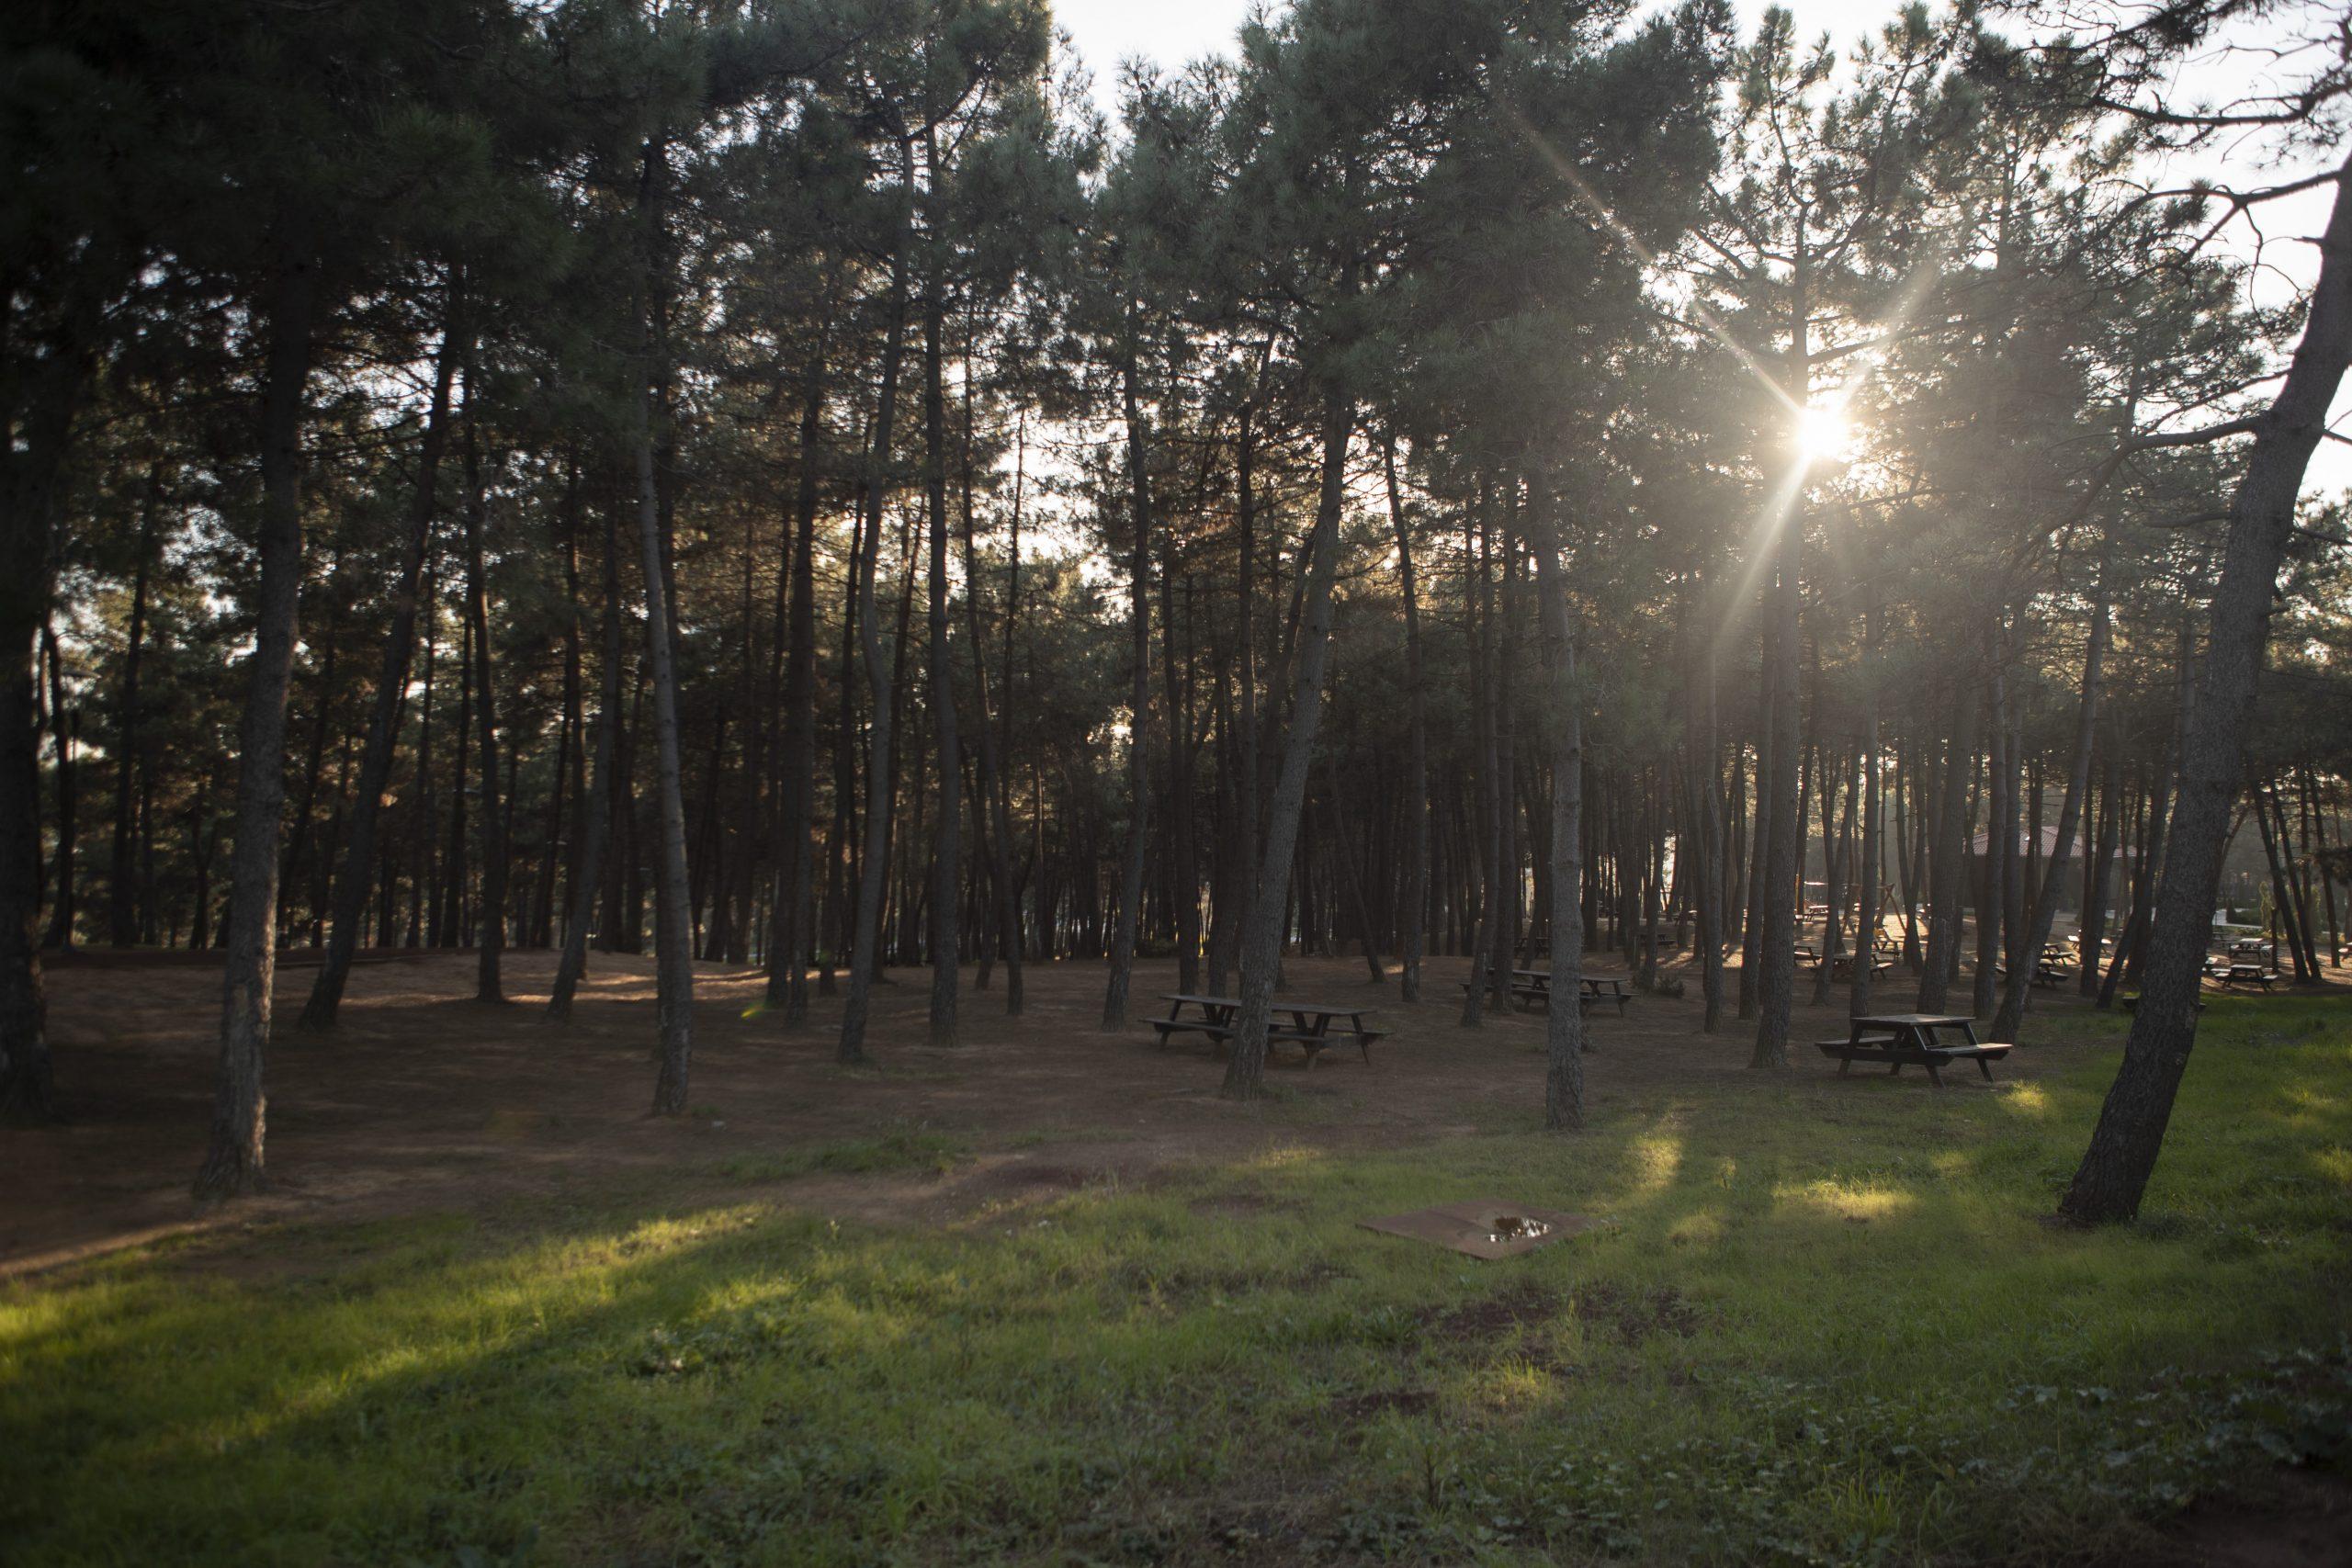 Hacegan Hatıra Ormanı